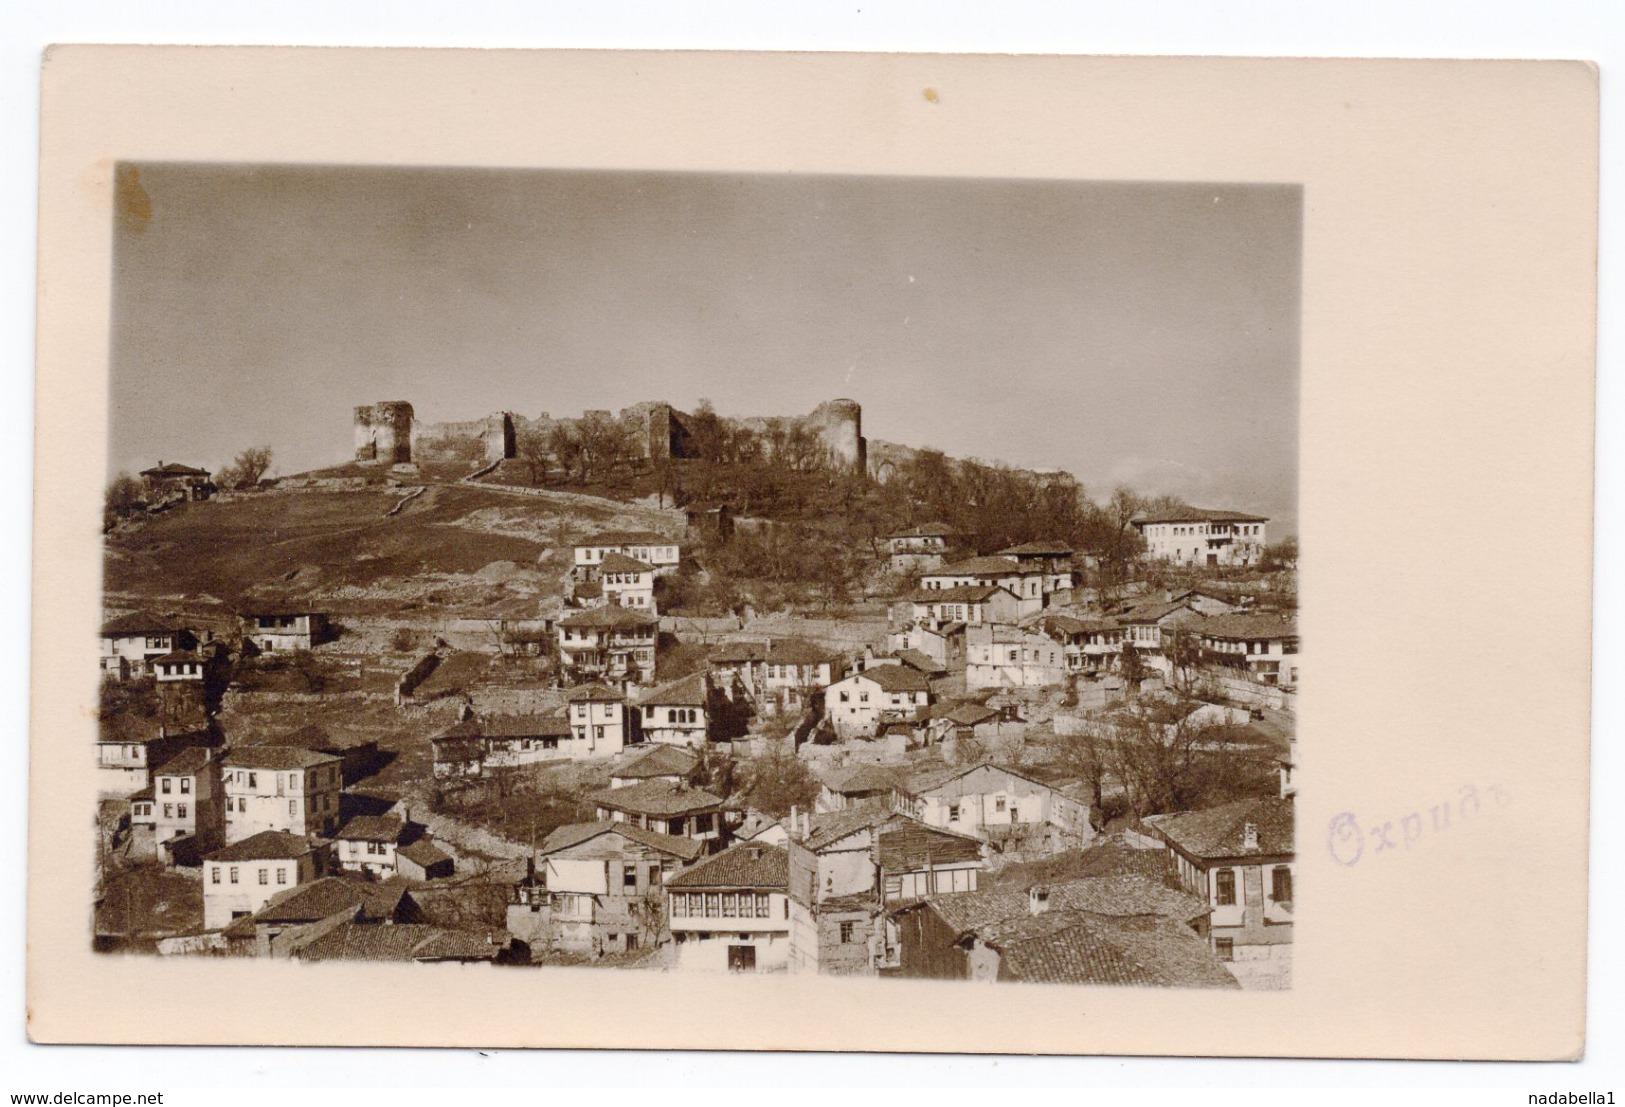 08.05.1945 YUGOSLAVIA, MACEDONIA, OHRID, TITO, DAY BEFORE END OF WWII - Yugoslavia